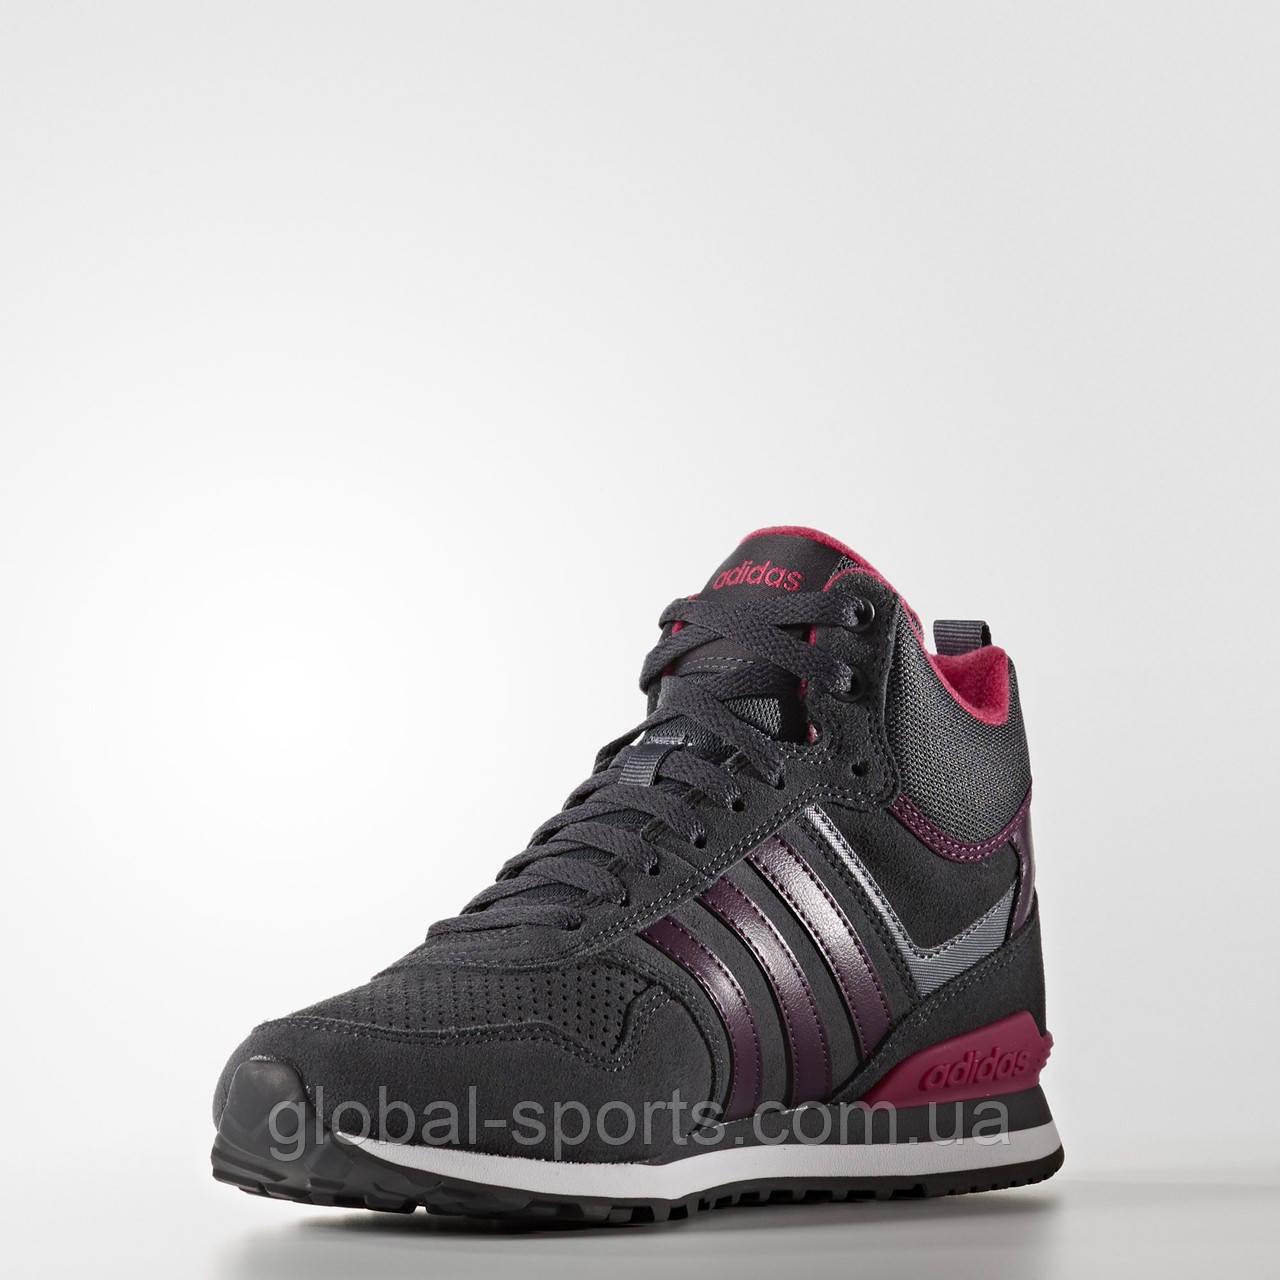 Женские зимние кроссовки Adidas 10XT Winter Mid W (Артикул:AW5245)